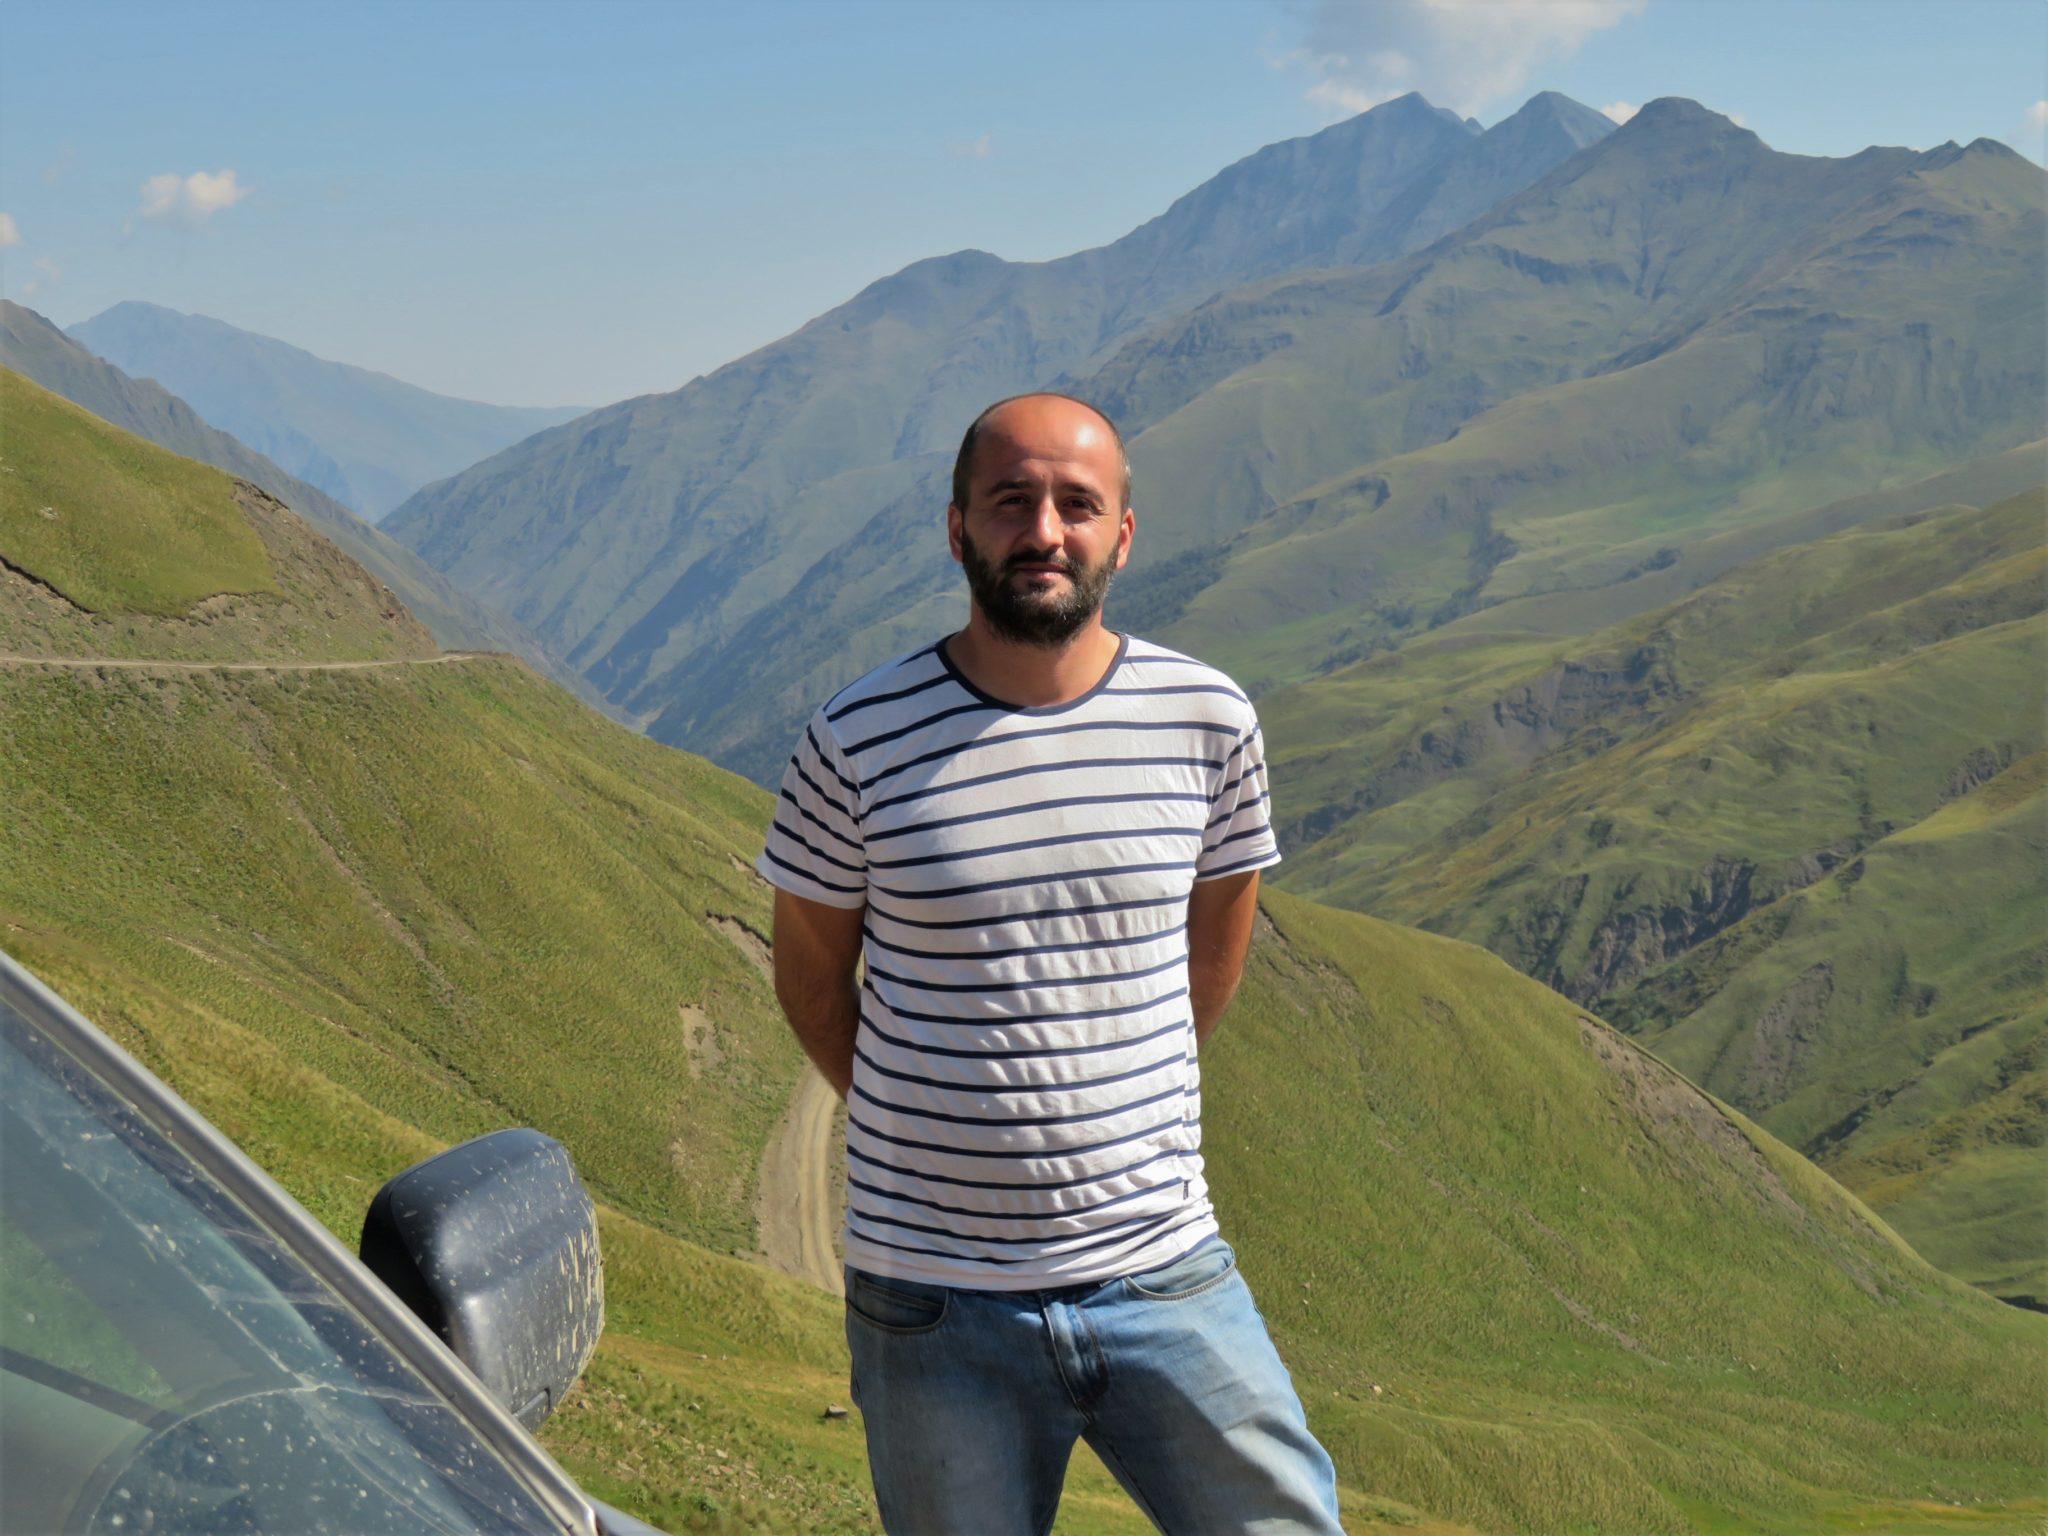 Kaukasus GeorgienWandern – Mostglobal Reiseblog Im hQCtsrd